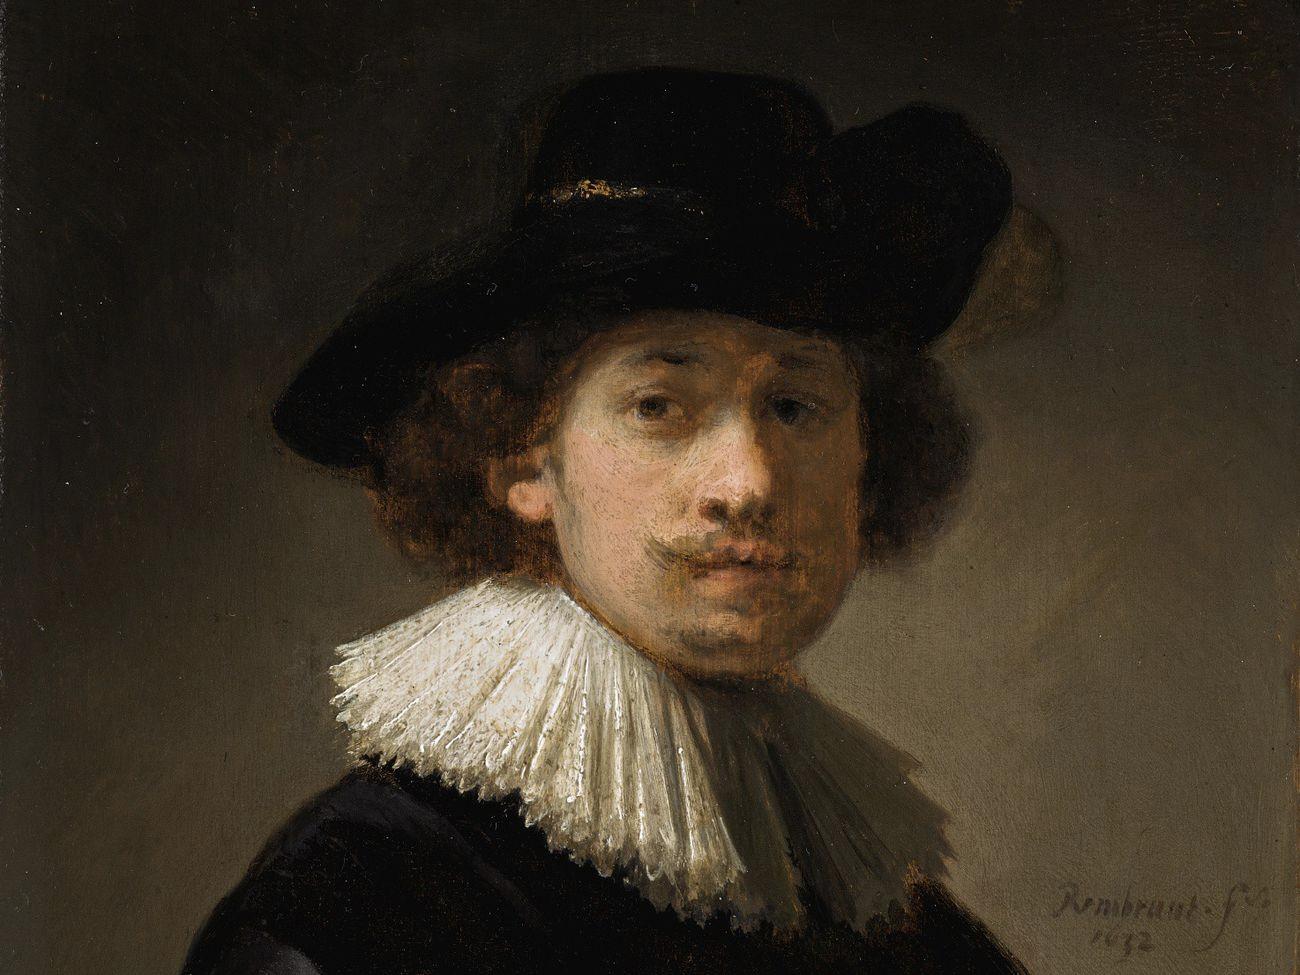 Автопортрет Рембрандта встановив новий рекорд на торгах Sotheby's